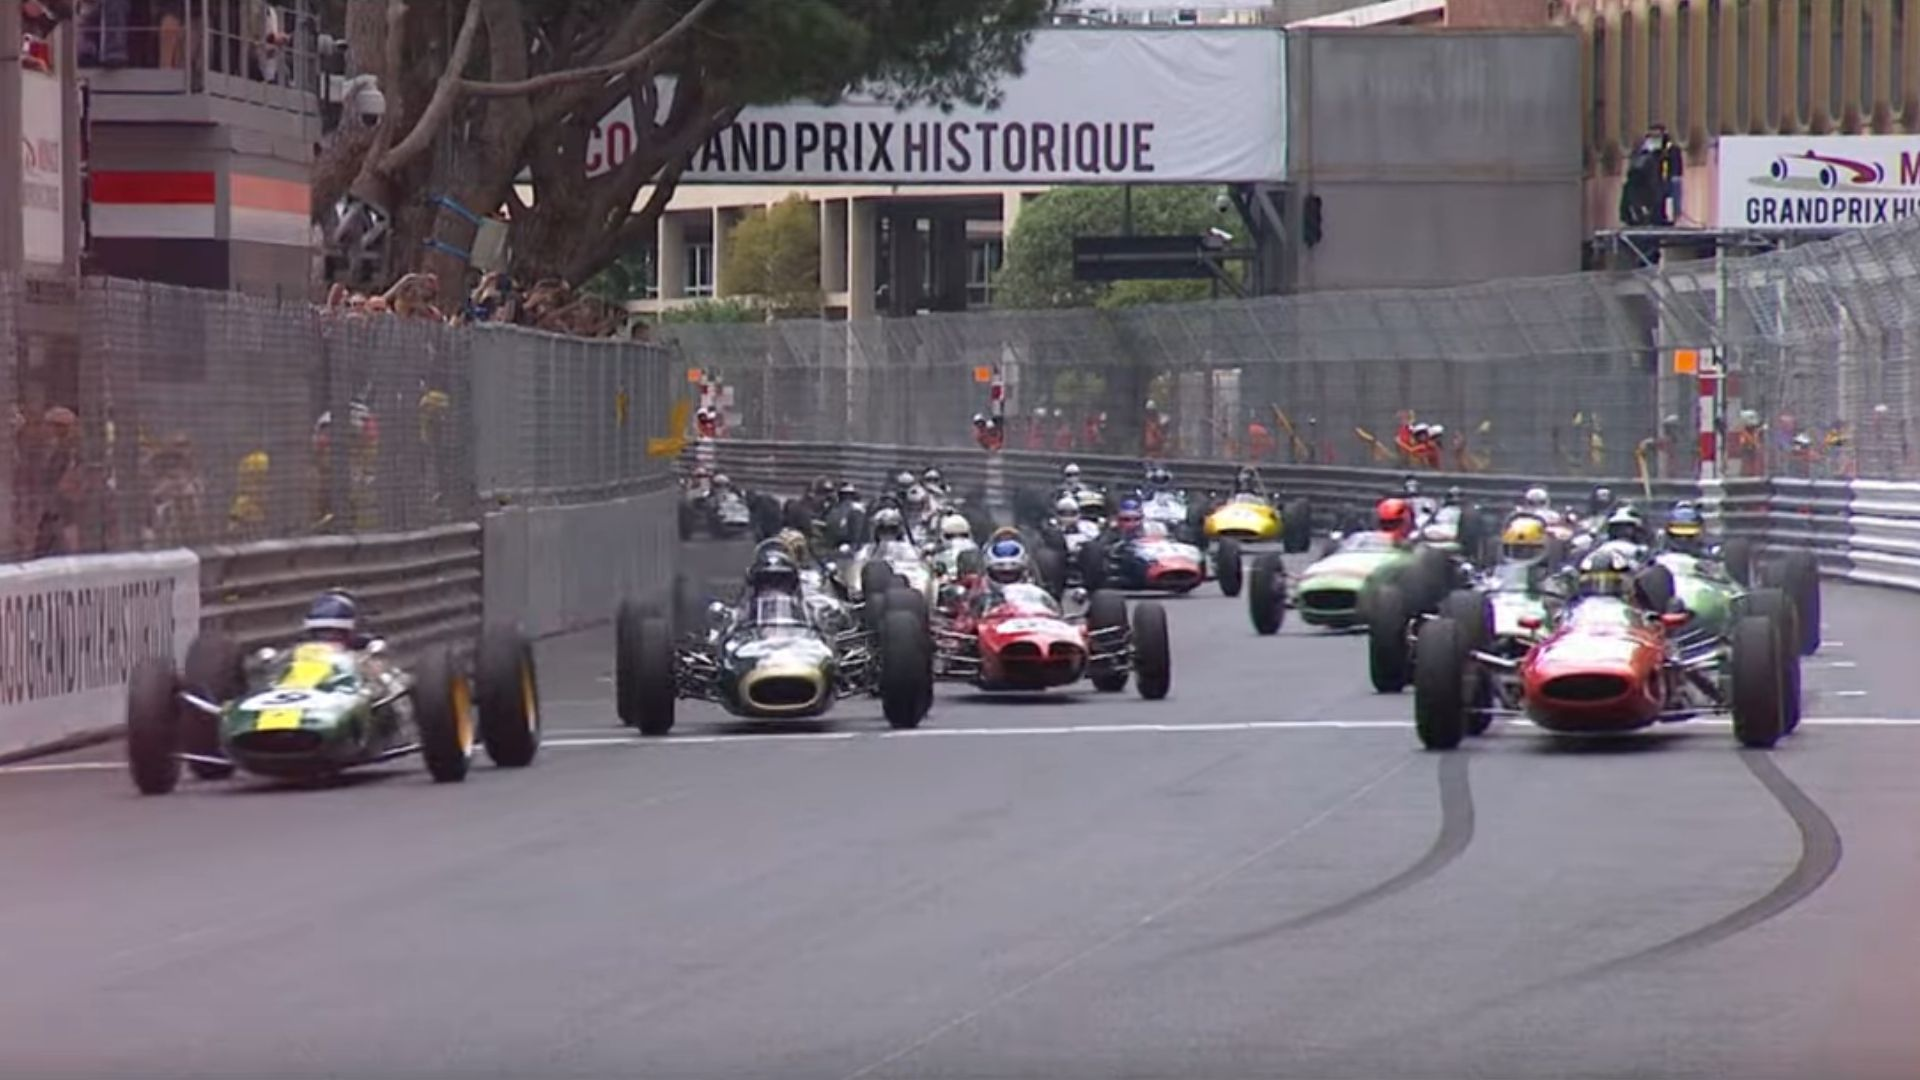 Watch This Monaco Grand Prix Documentary